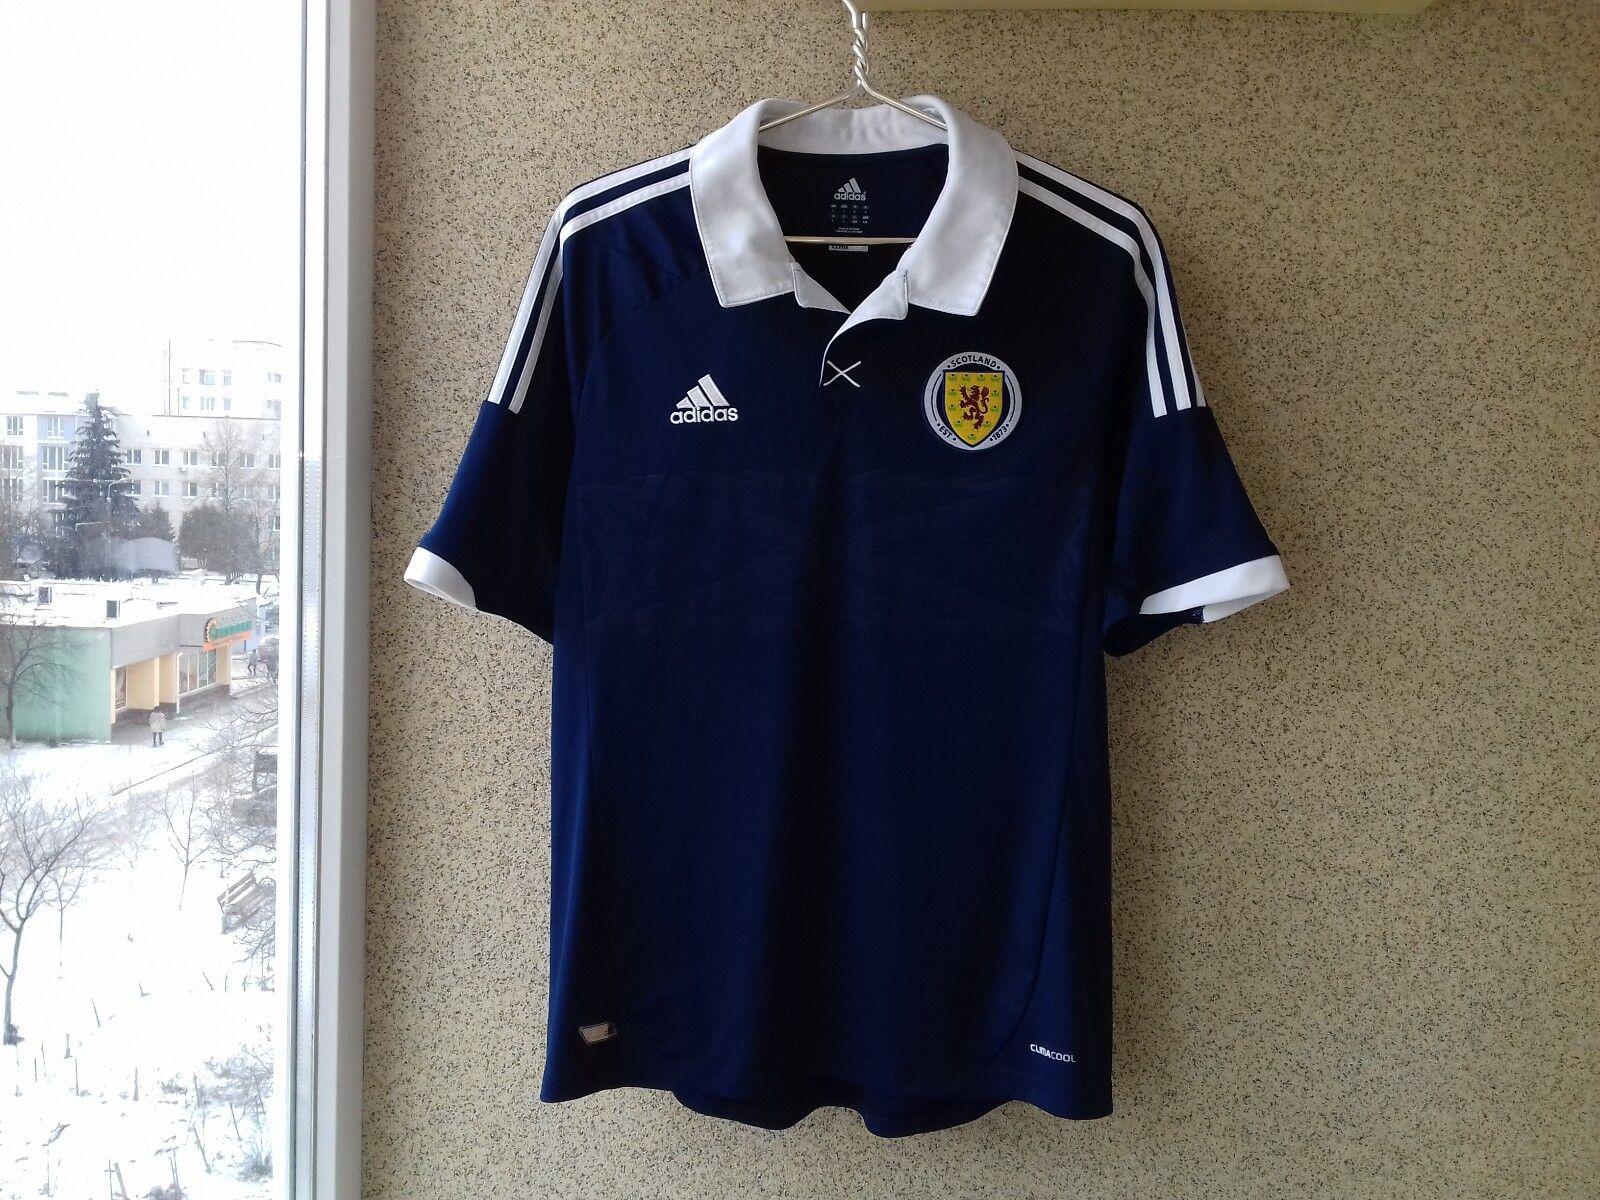 d204b3fa2 Scotland 2012 2013 2014 Adidas Jersey Home football shirt L Soccer Camiseta